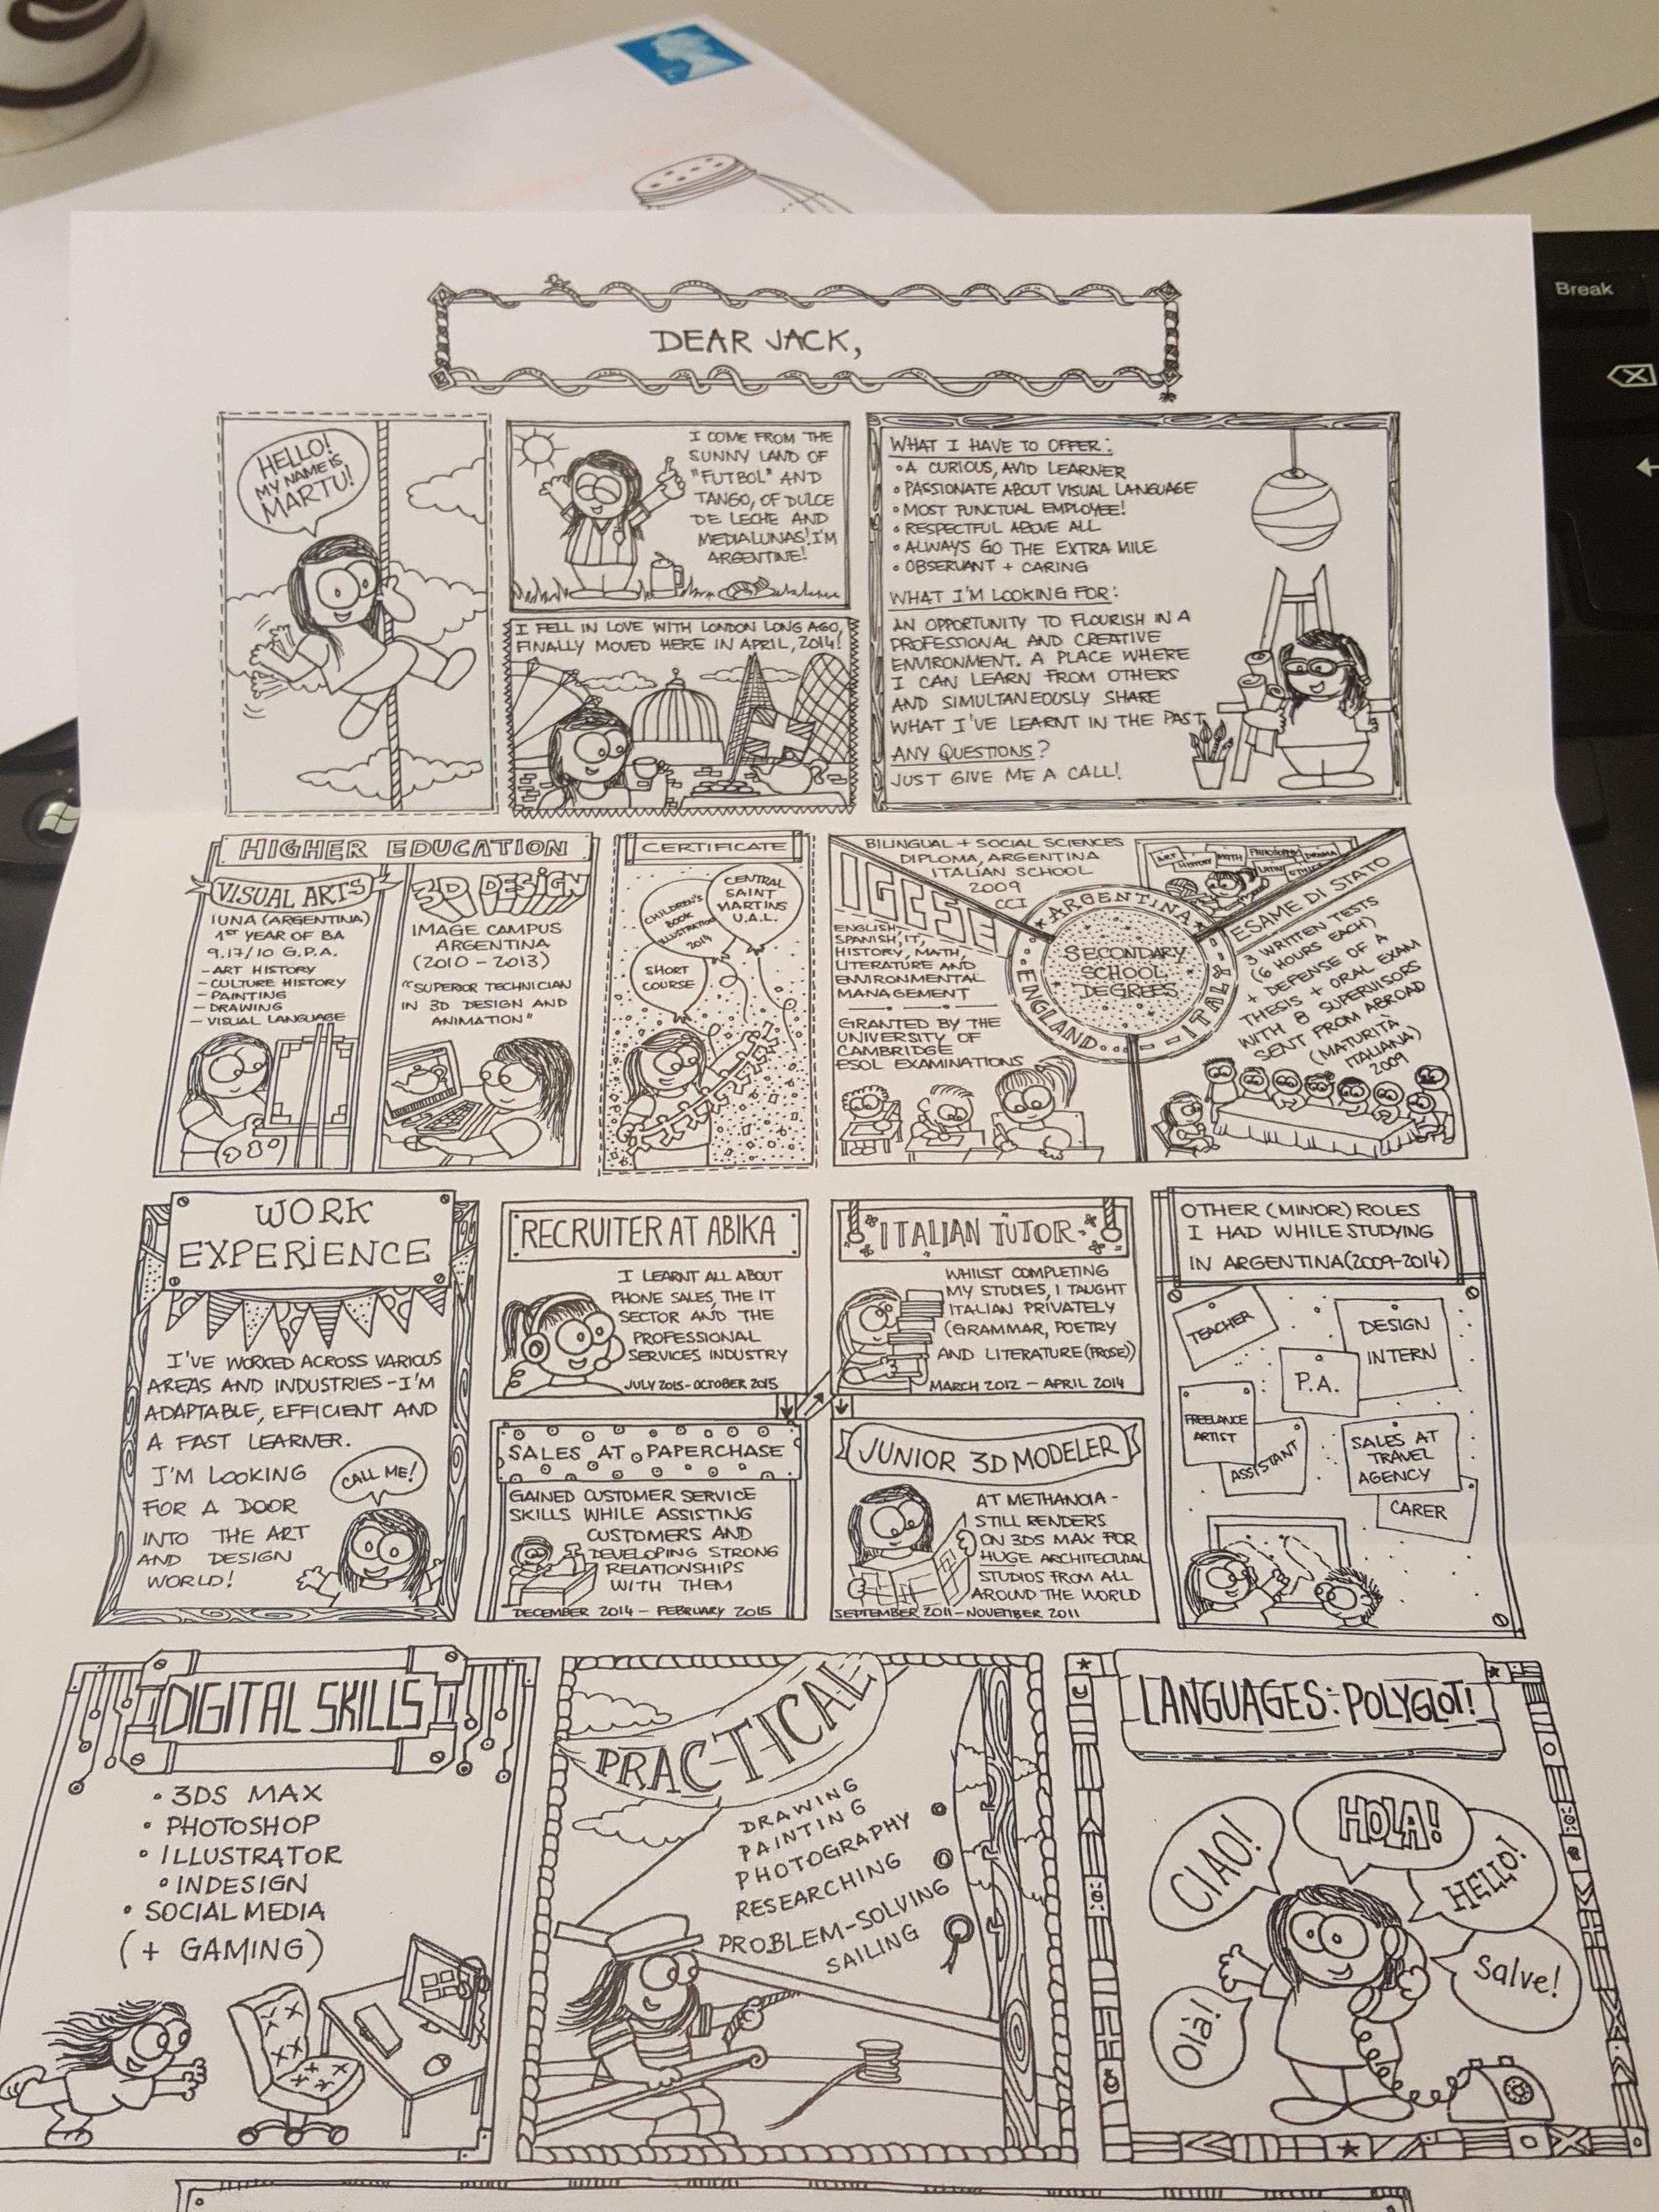 Brilliant hand drawn C.V. Now thats creative. LinkedIn | Your ...